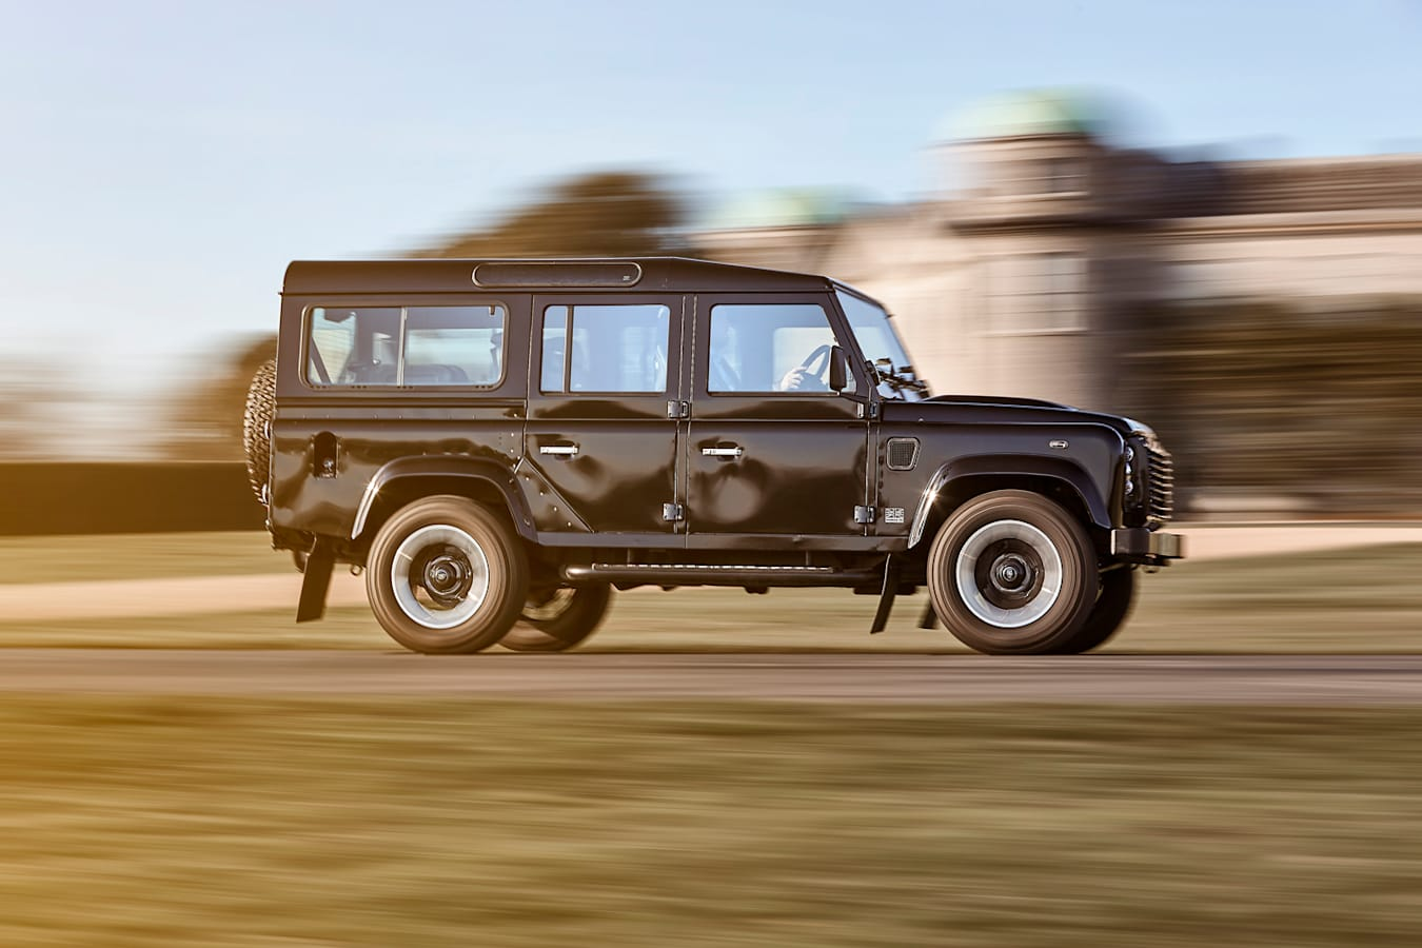 Goodwood Land Rover